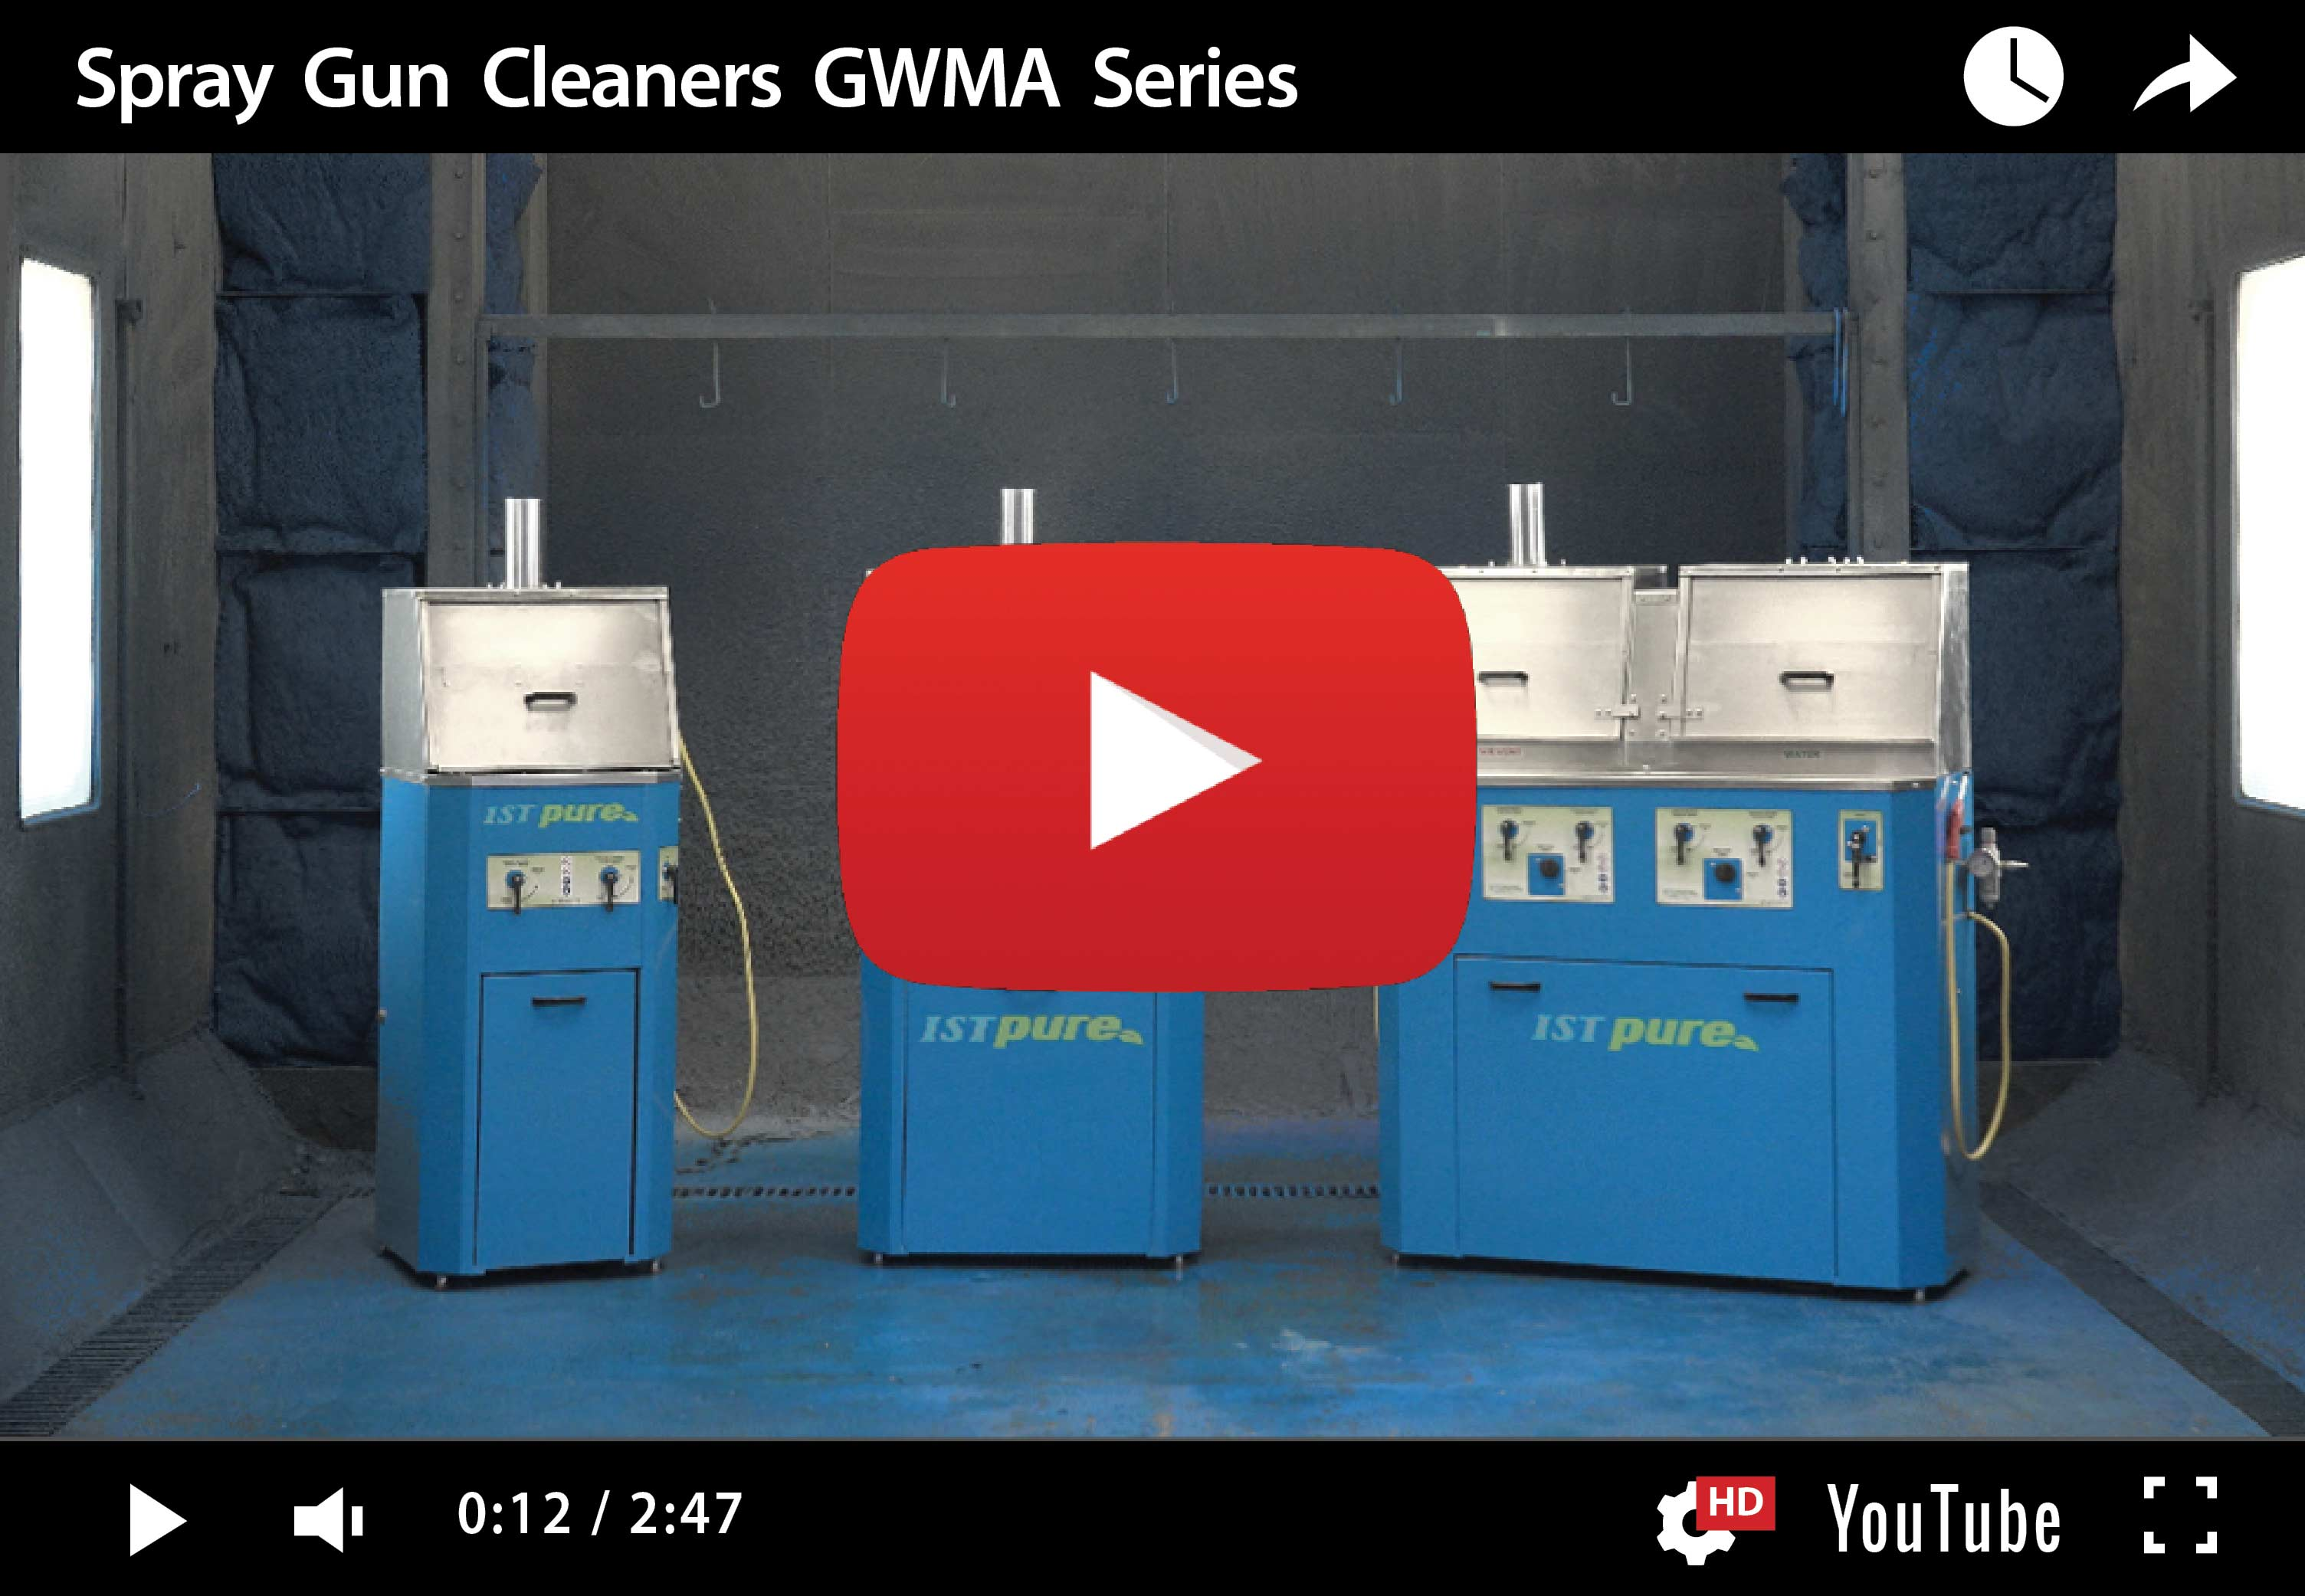 GWM 300 – Manual Spray Gun Cleaner